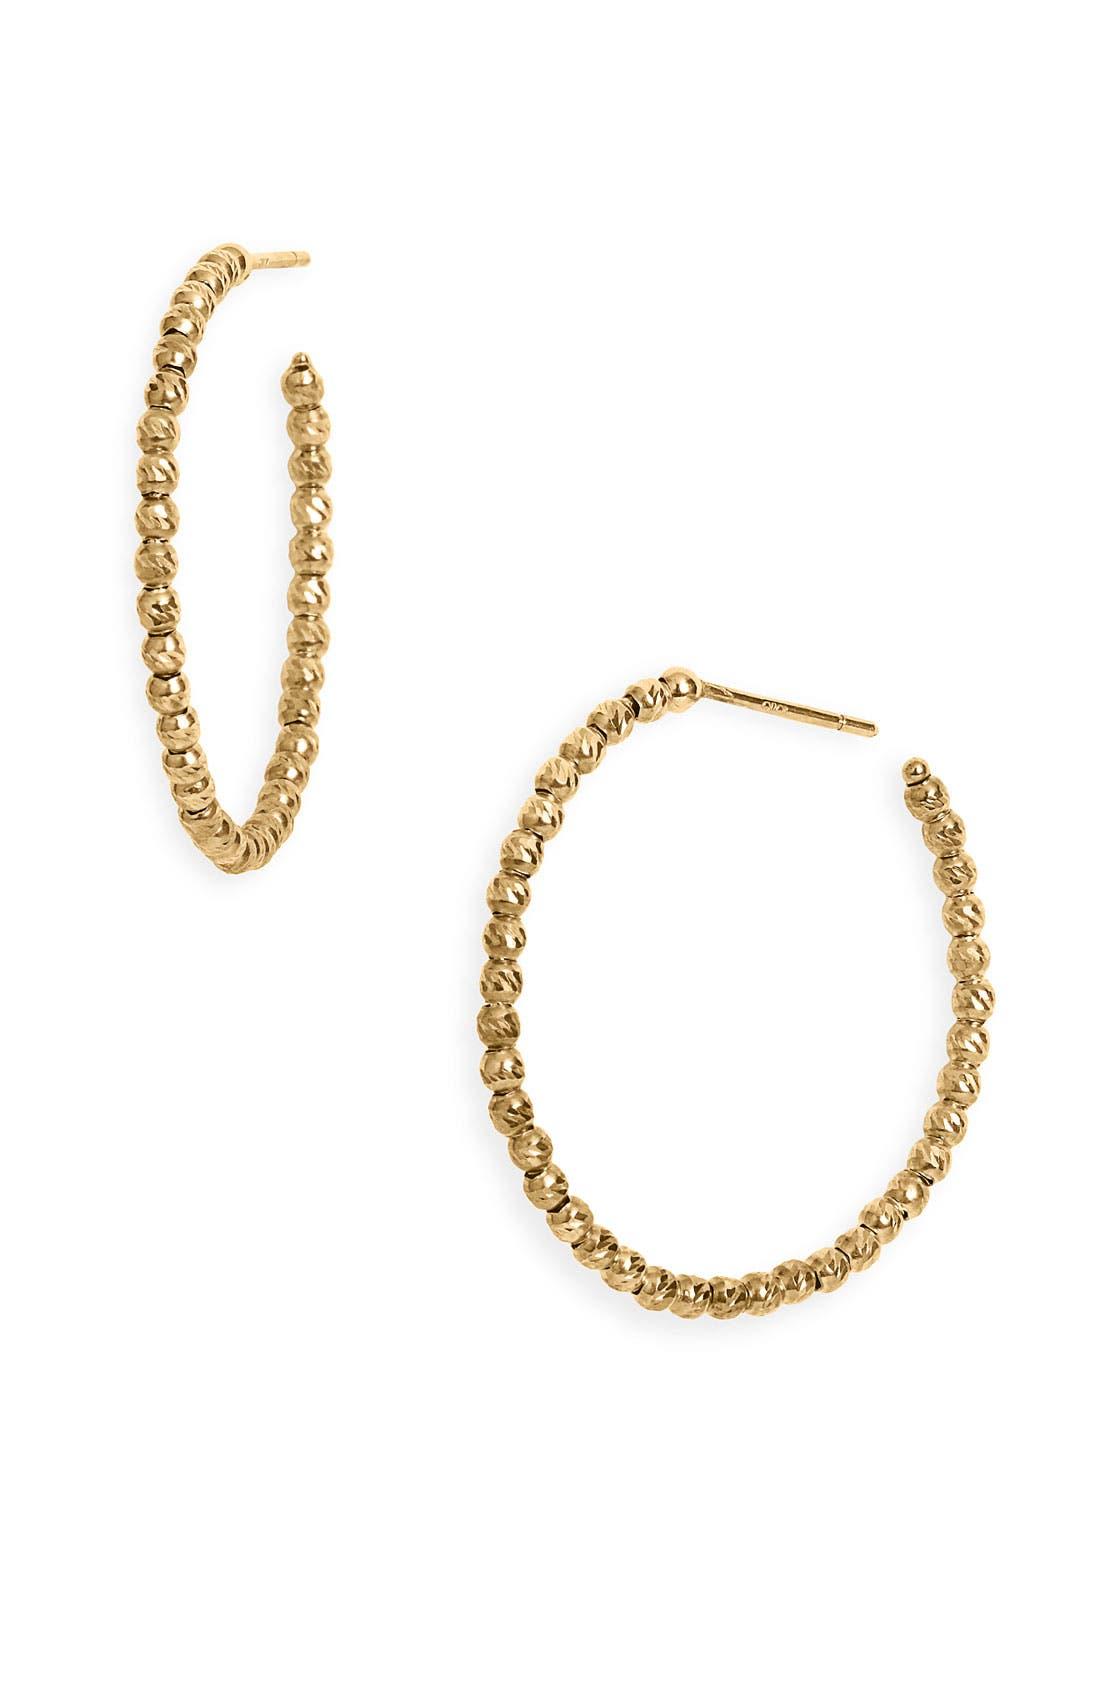 Alternate Image 1 Selected - Lana Jewelry 'Small Olivia' Bead Earrings